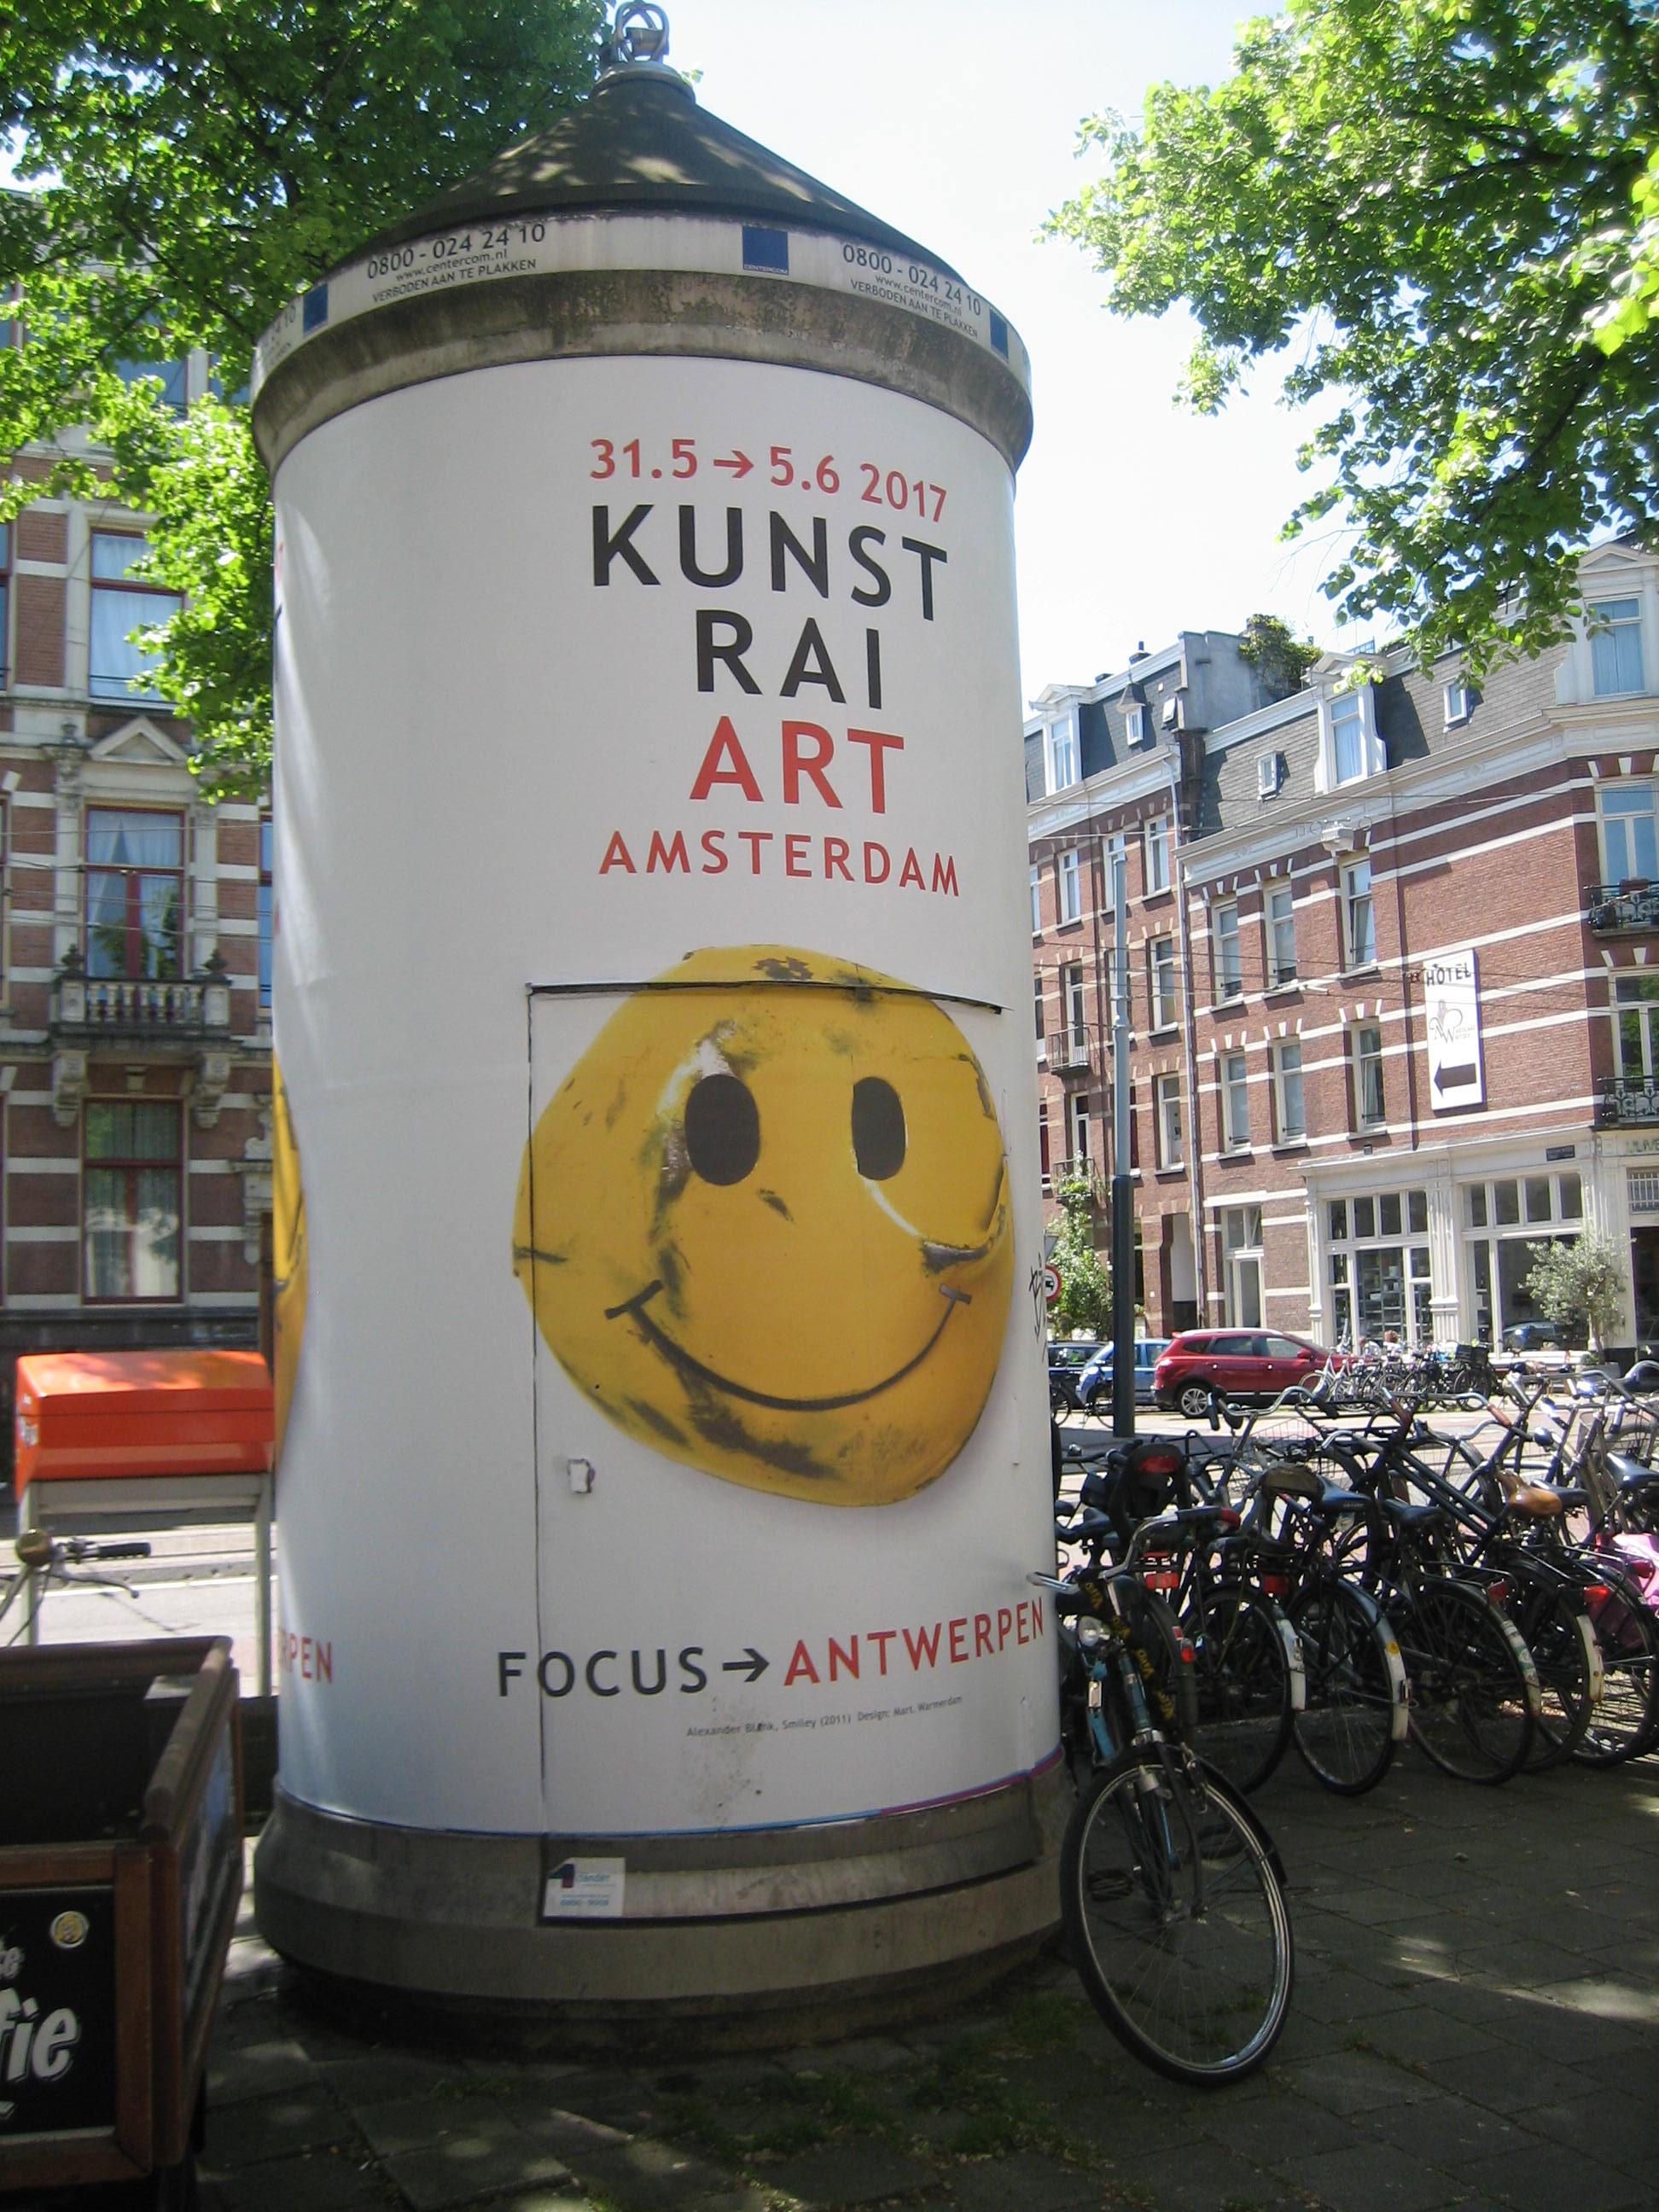 Alexander Blank, broche op affiche KunstRAI 2017, Amsterdam. Foto Esther Doornbusch, CC BY 4.0